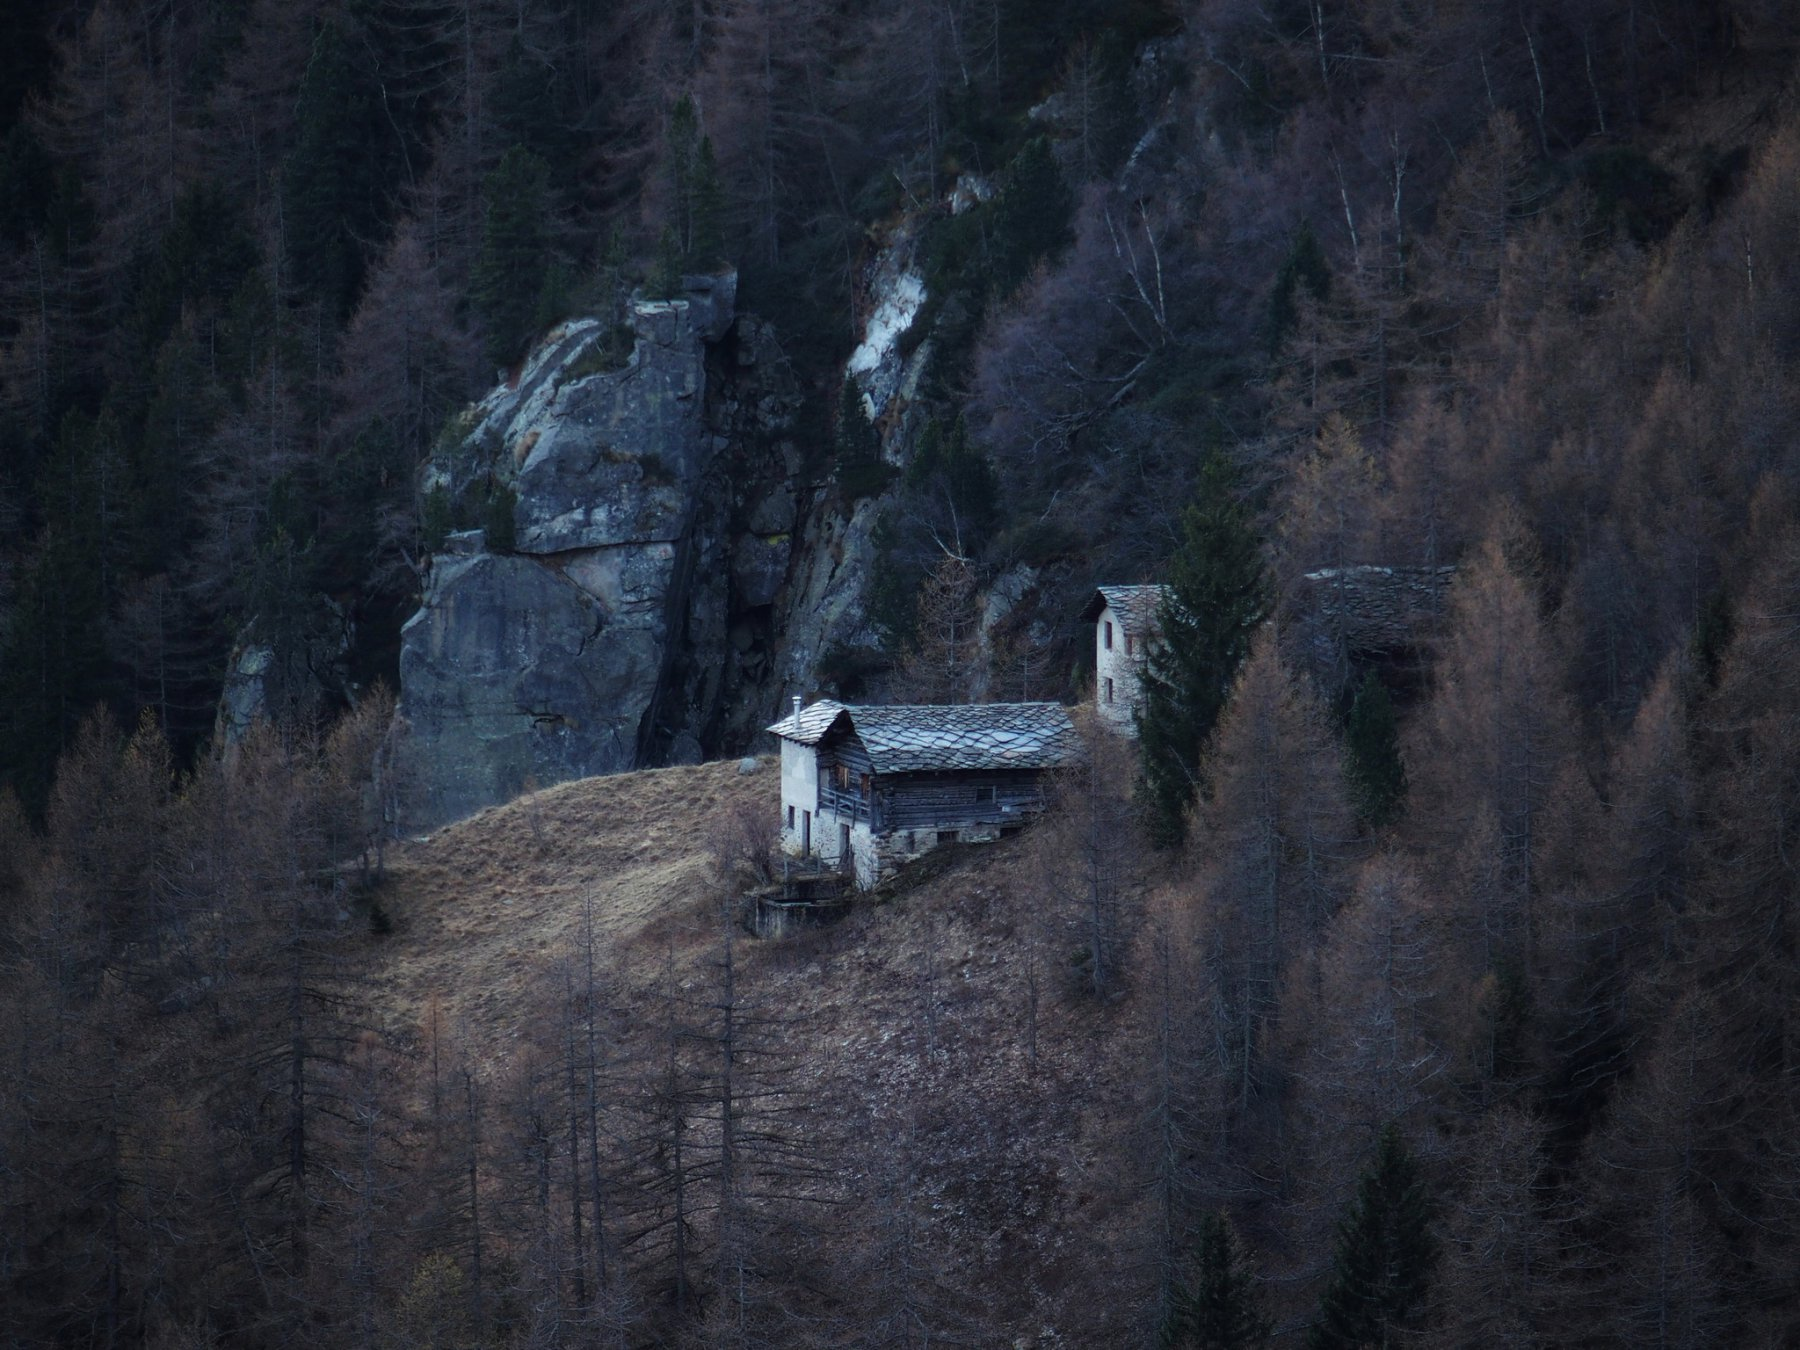 La sperdutissima Alpe Mittelkrejz